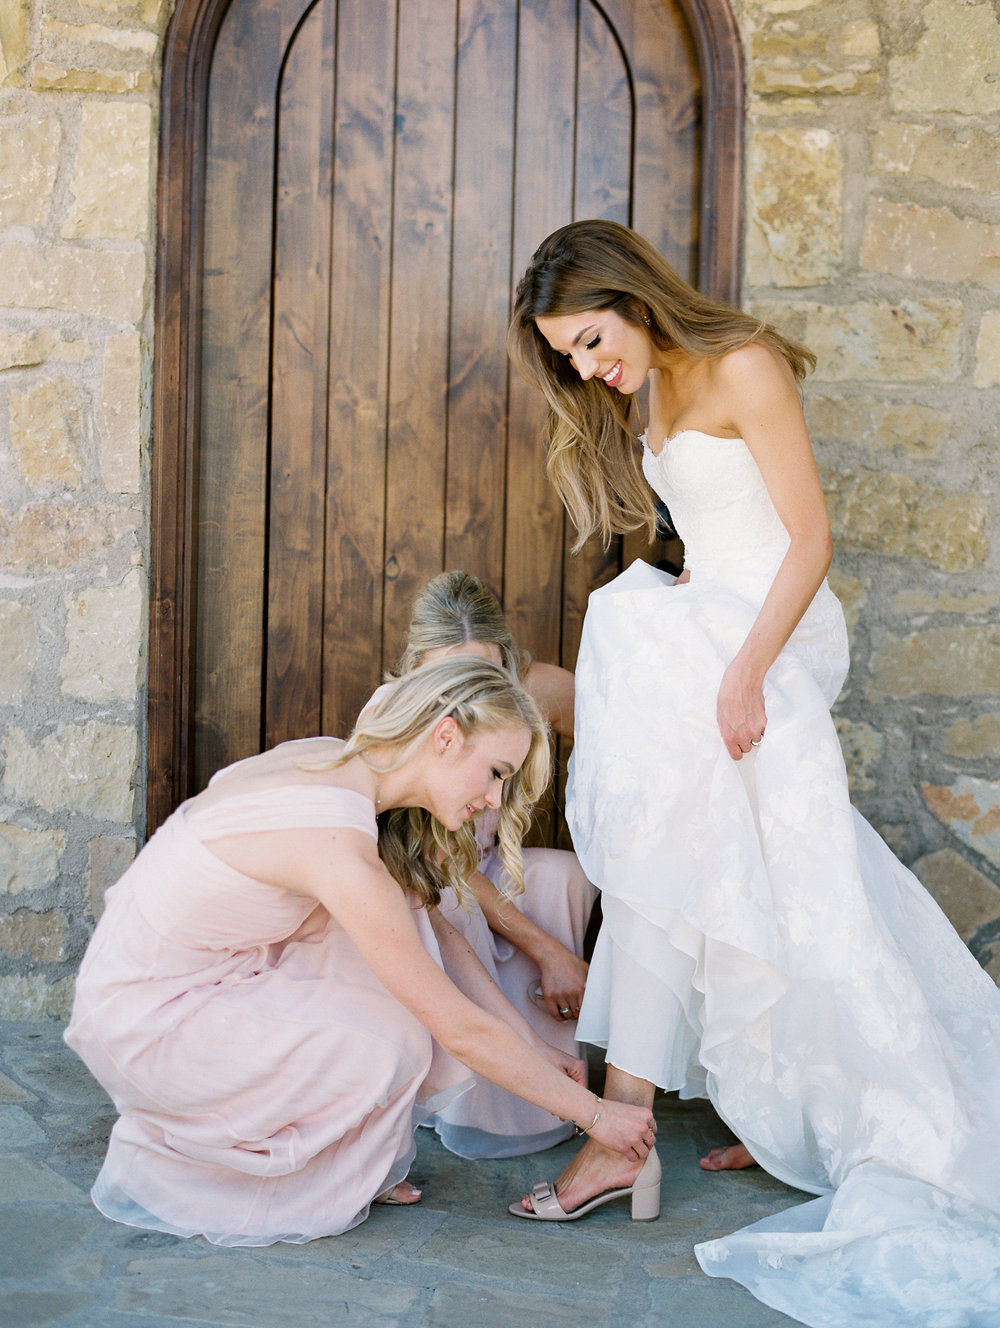 Escondido-Golf_Lake-Club-Hill-Country-Houston-Wedding-Photographer-Best-Top-Luxury-Destination-Engagements-Portrait-Austin-Photography-52.jpg